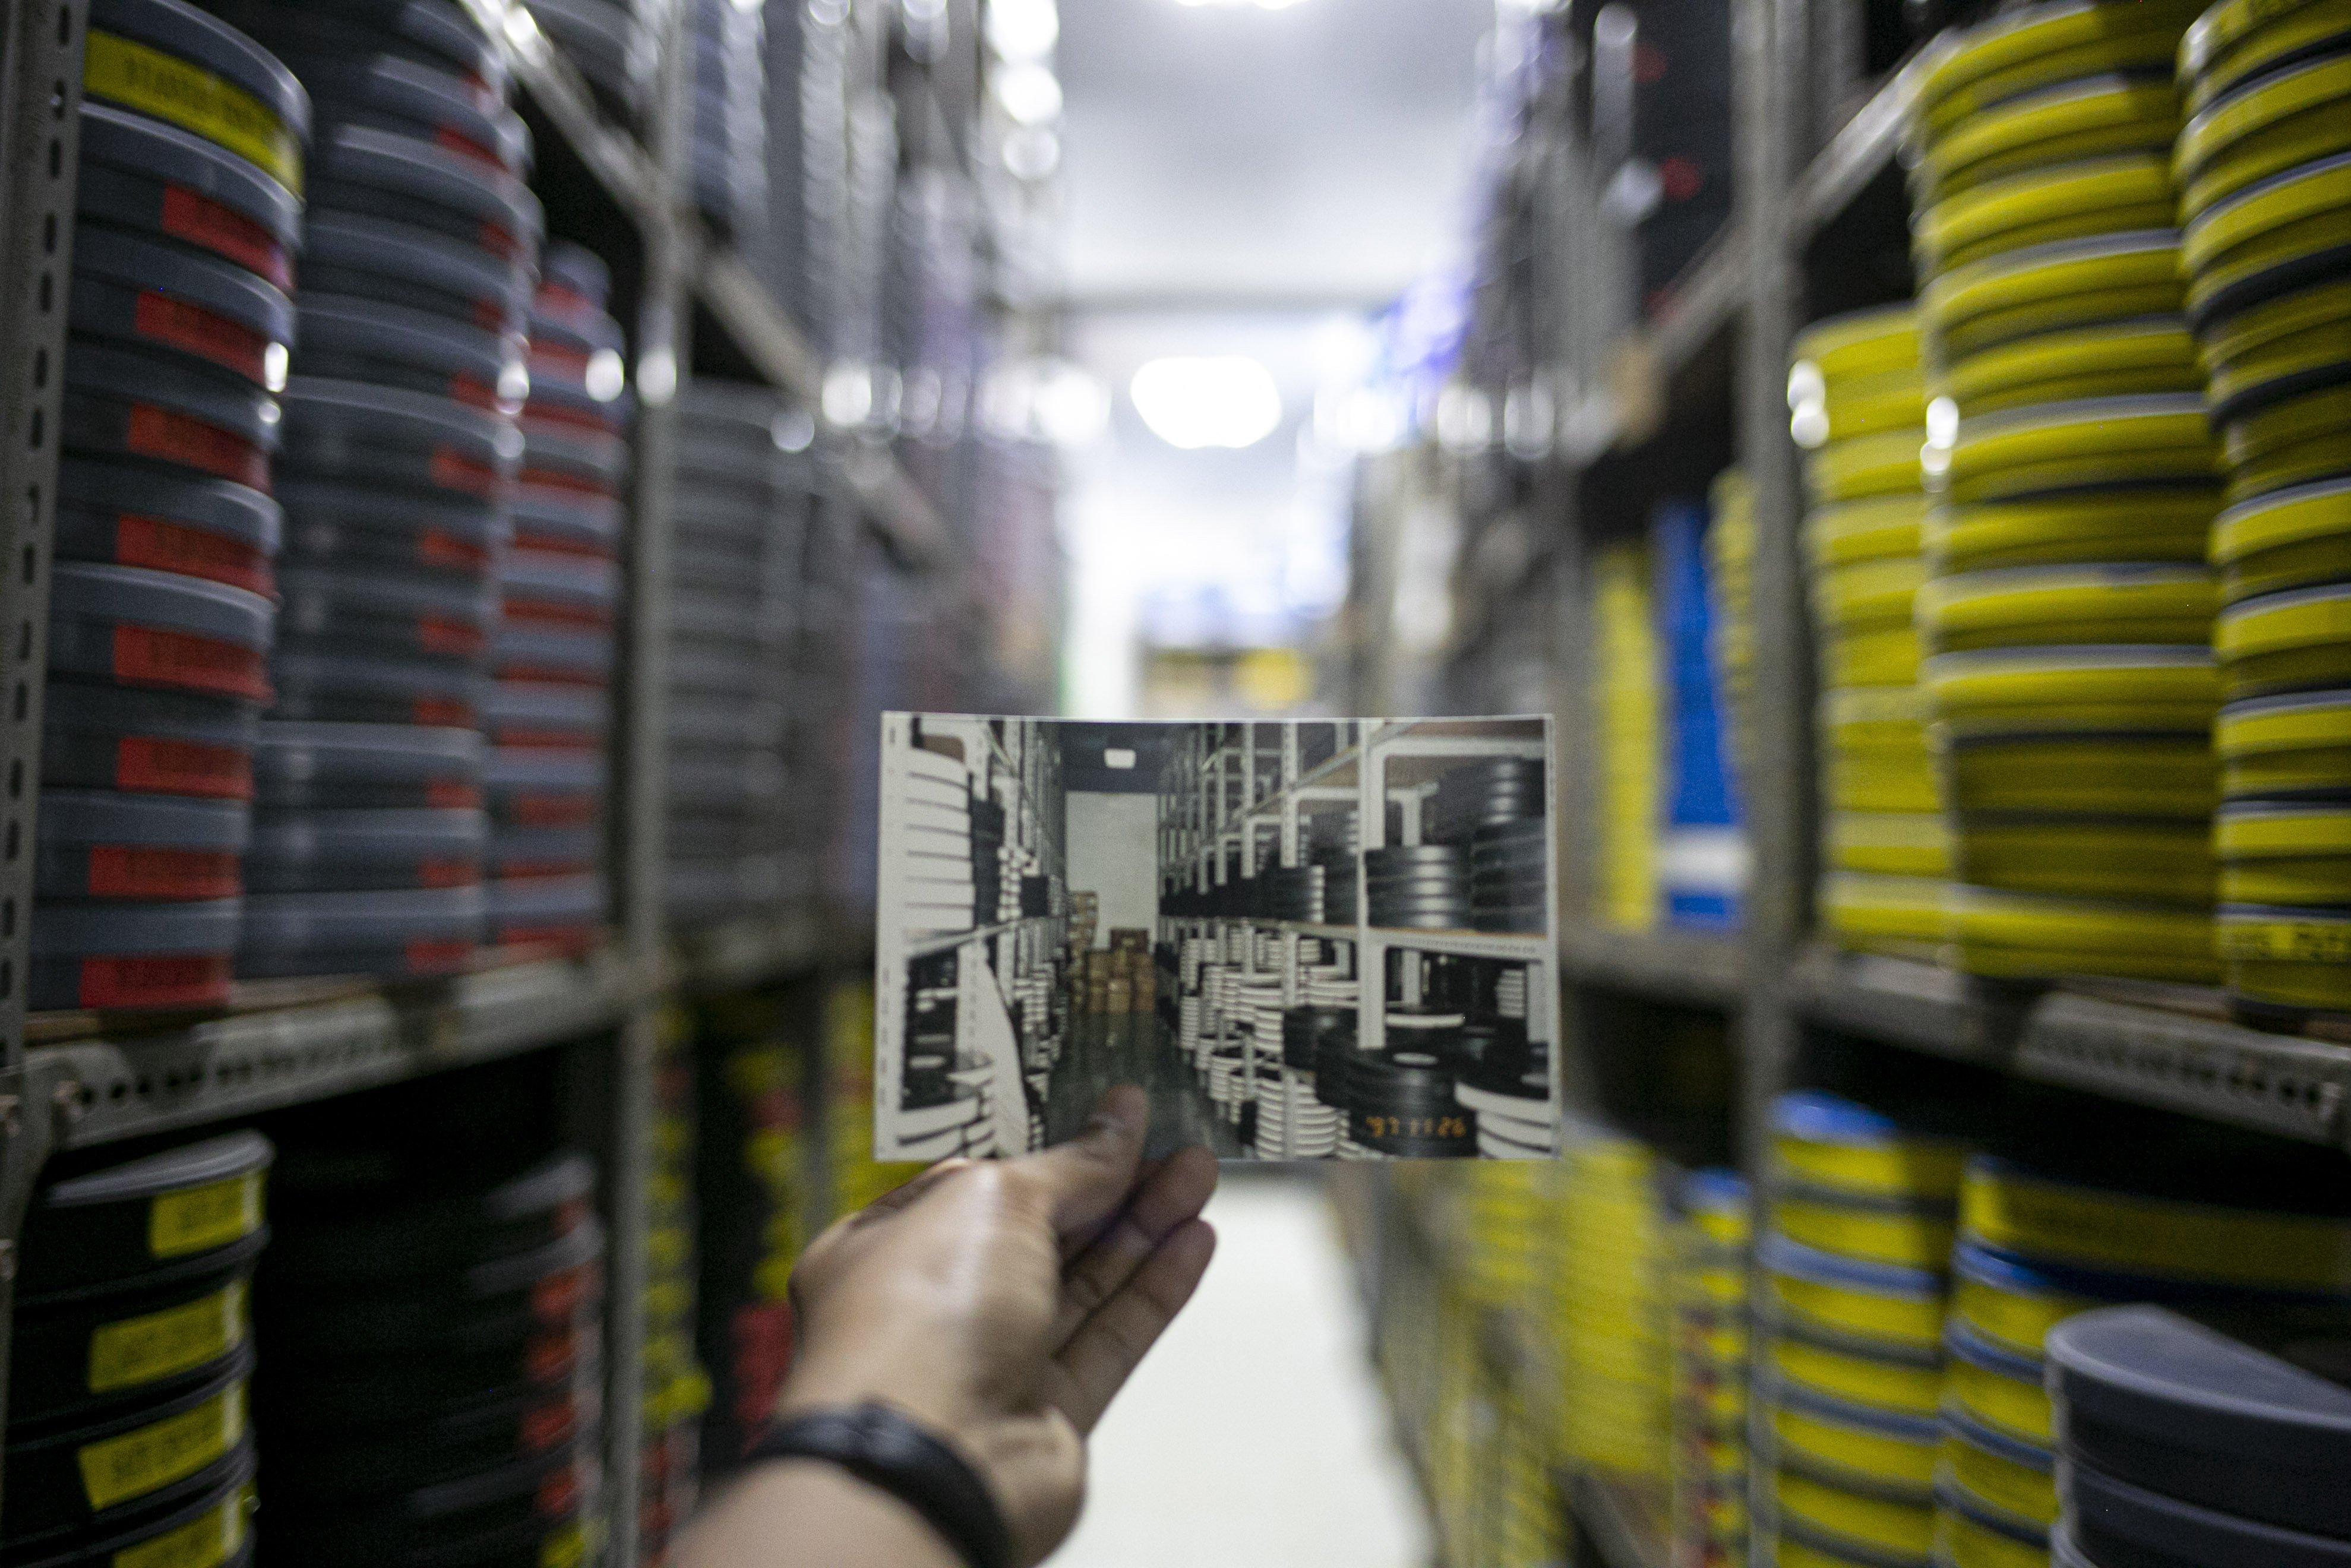 Foto jaman dulu gudang gulungan film seluloid di Gedung Sinematek, jalan HR. Rasuna Said, RT.2/RW.5, Karet Kuningan, Kecamatan Setiabudi, Kota Jakarta Selatan.